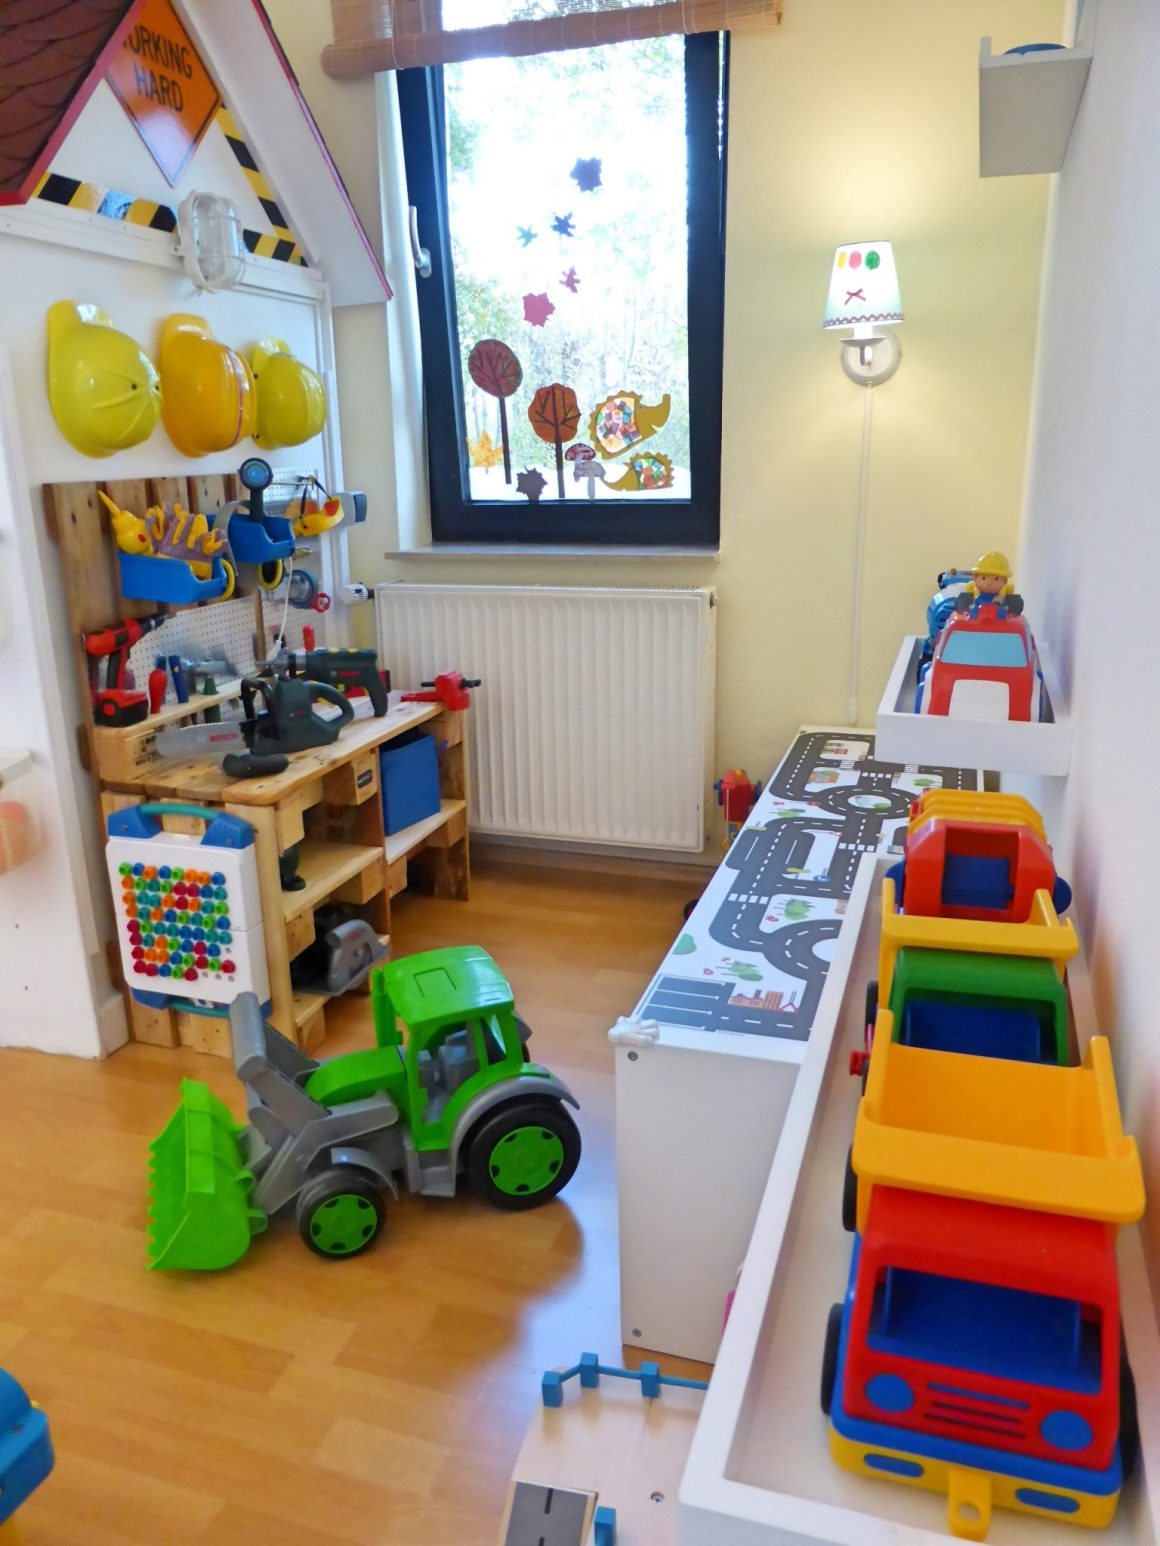 spielzimmer-9-kita-kid-zone-kinderbetreuung